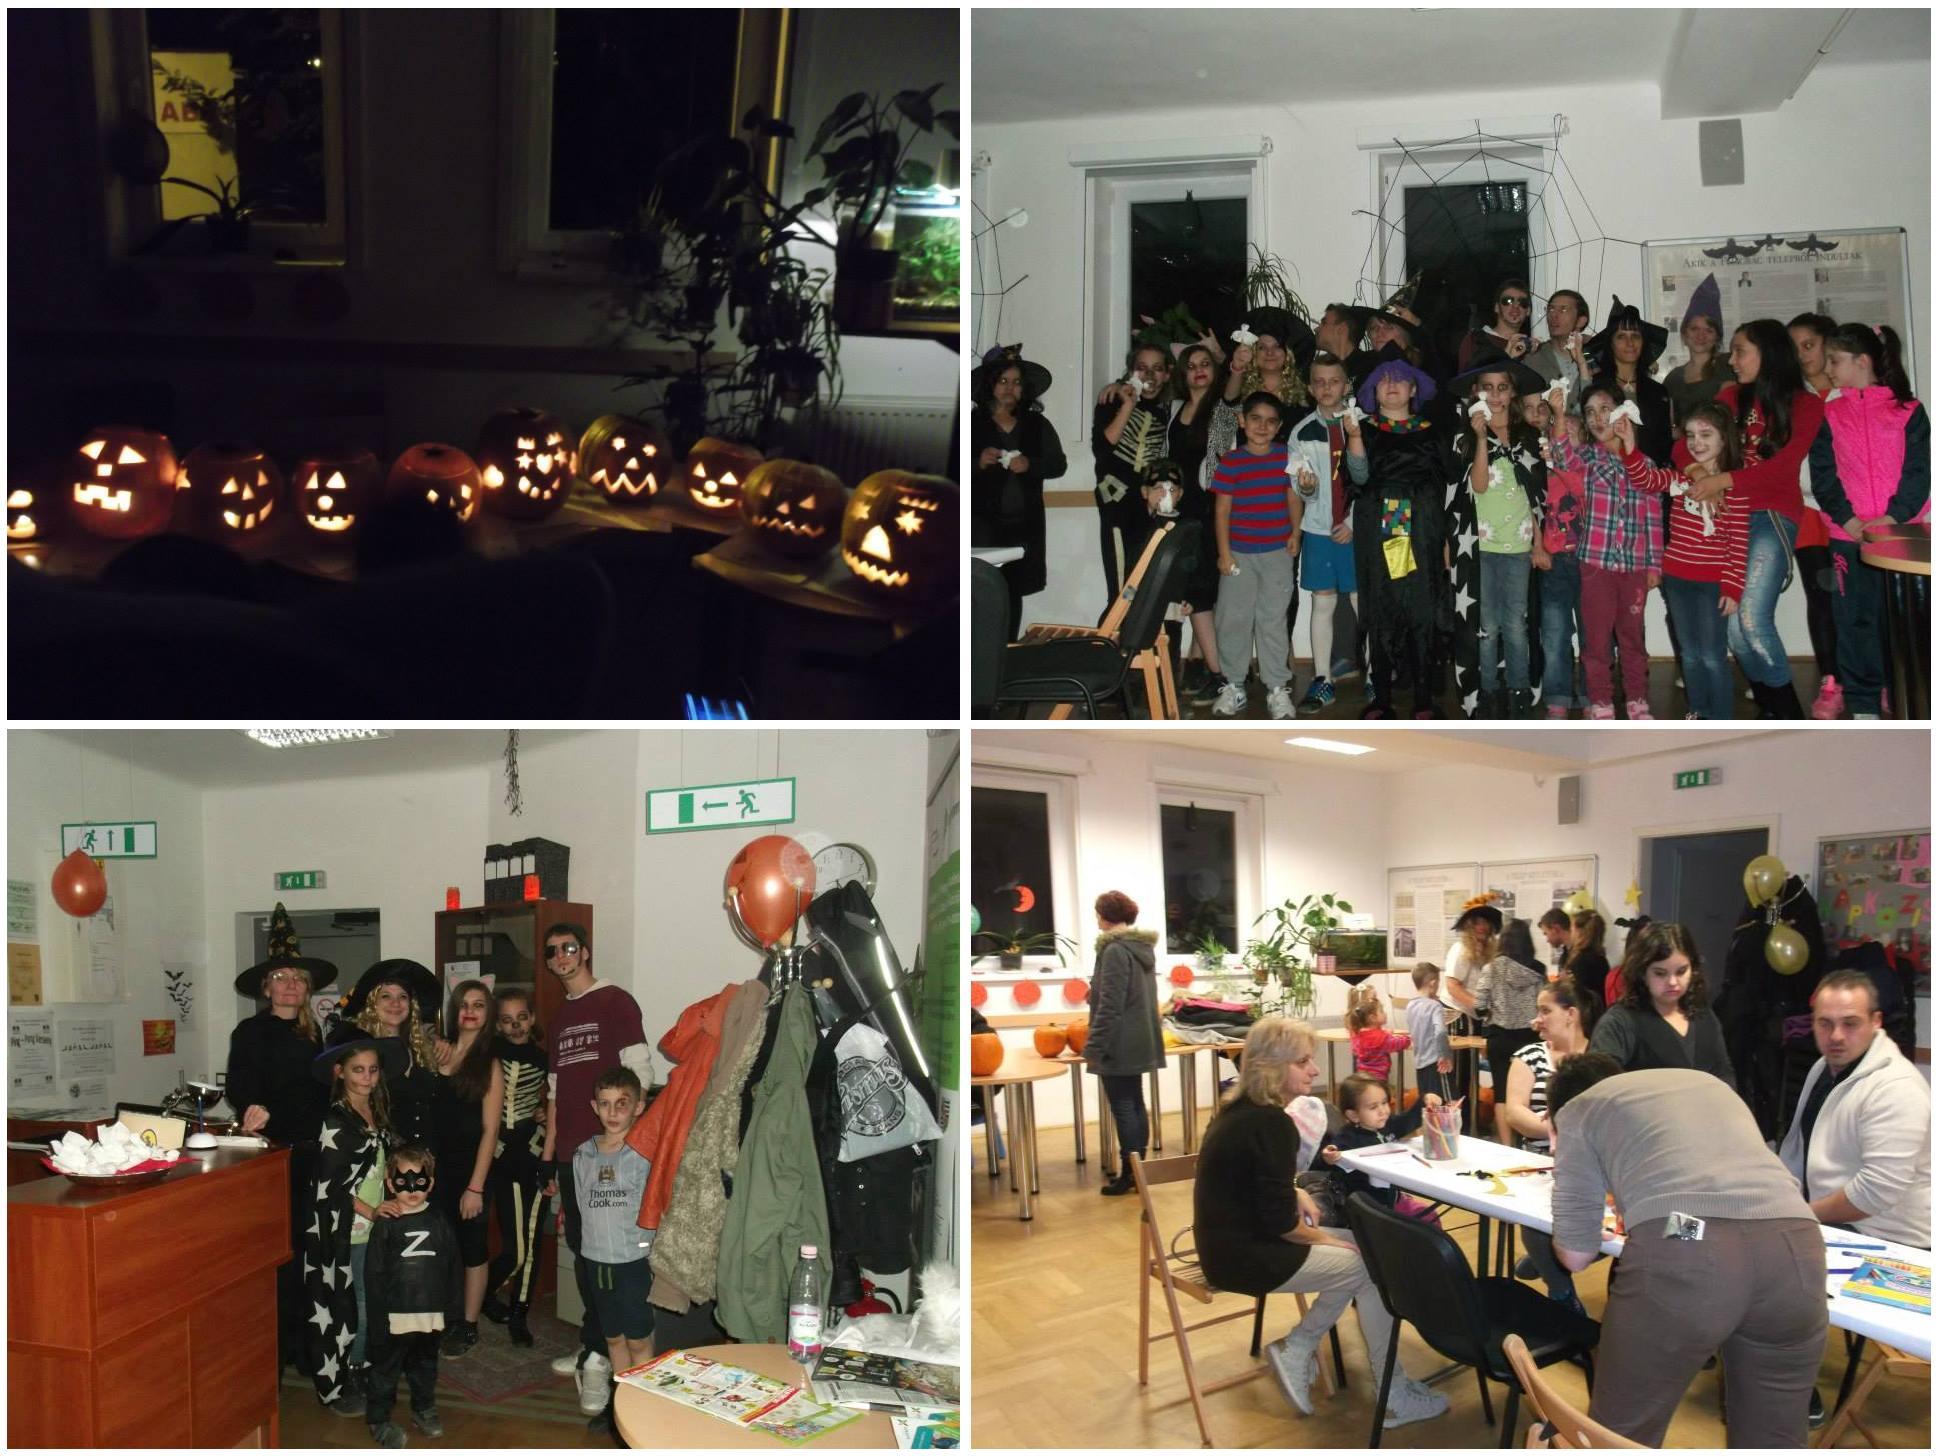 2014.10.28_PKH_halloweeni_kezmuves_buli_tablo